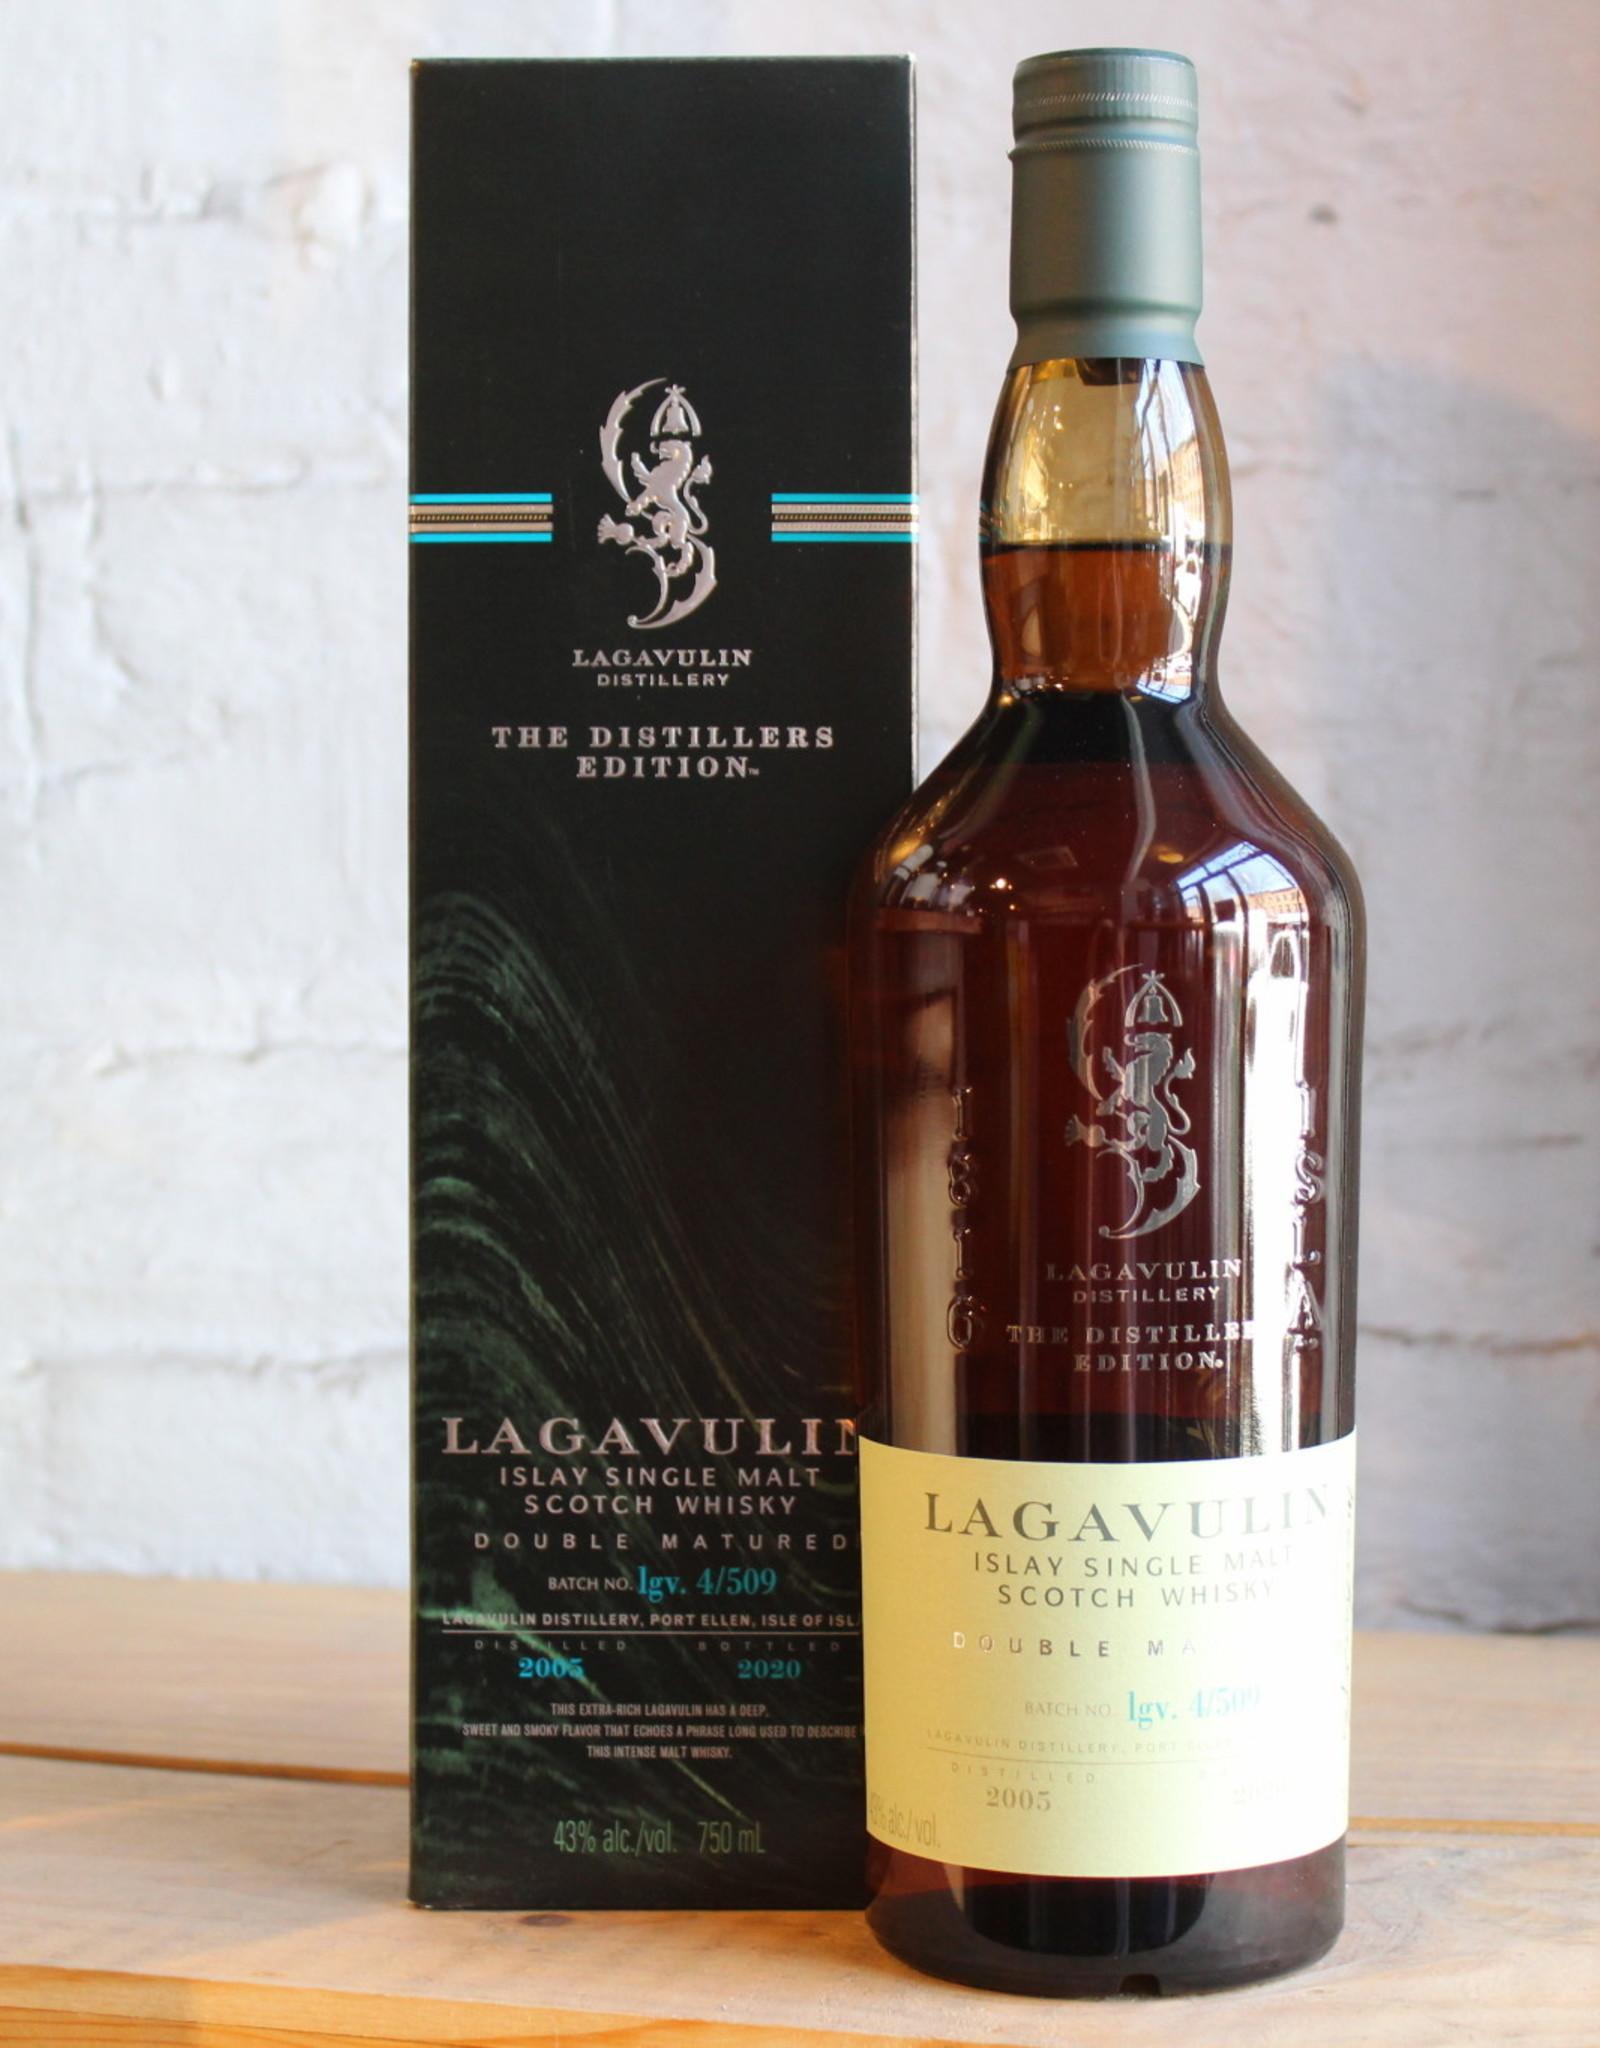 Lagavulin 2005 Distiller's Edition Double Matured 15yr Single Malt Scotch Whisky - Islay, Scotland (750ml)